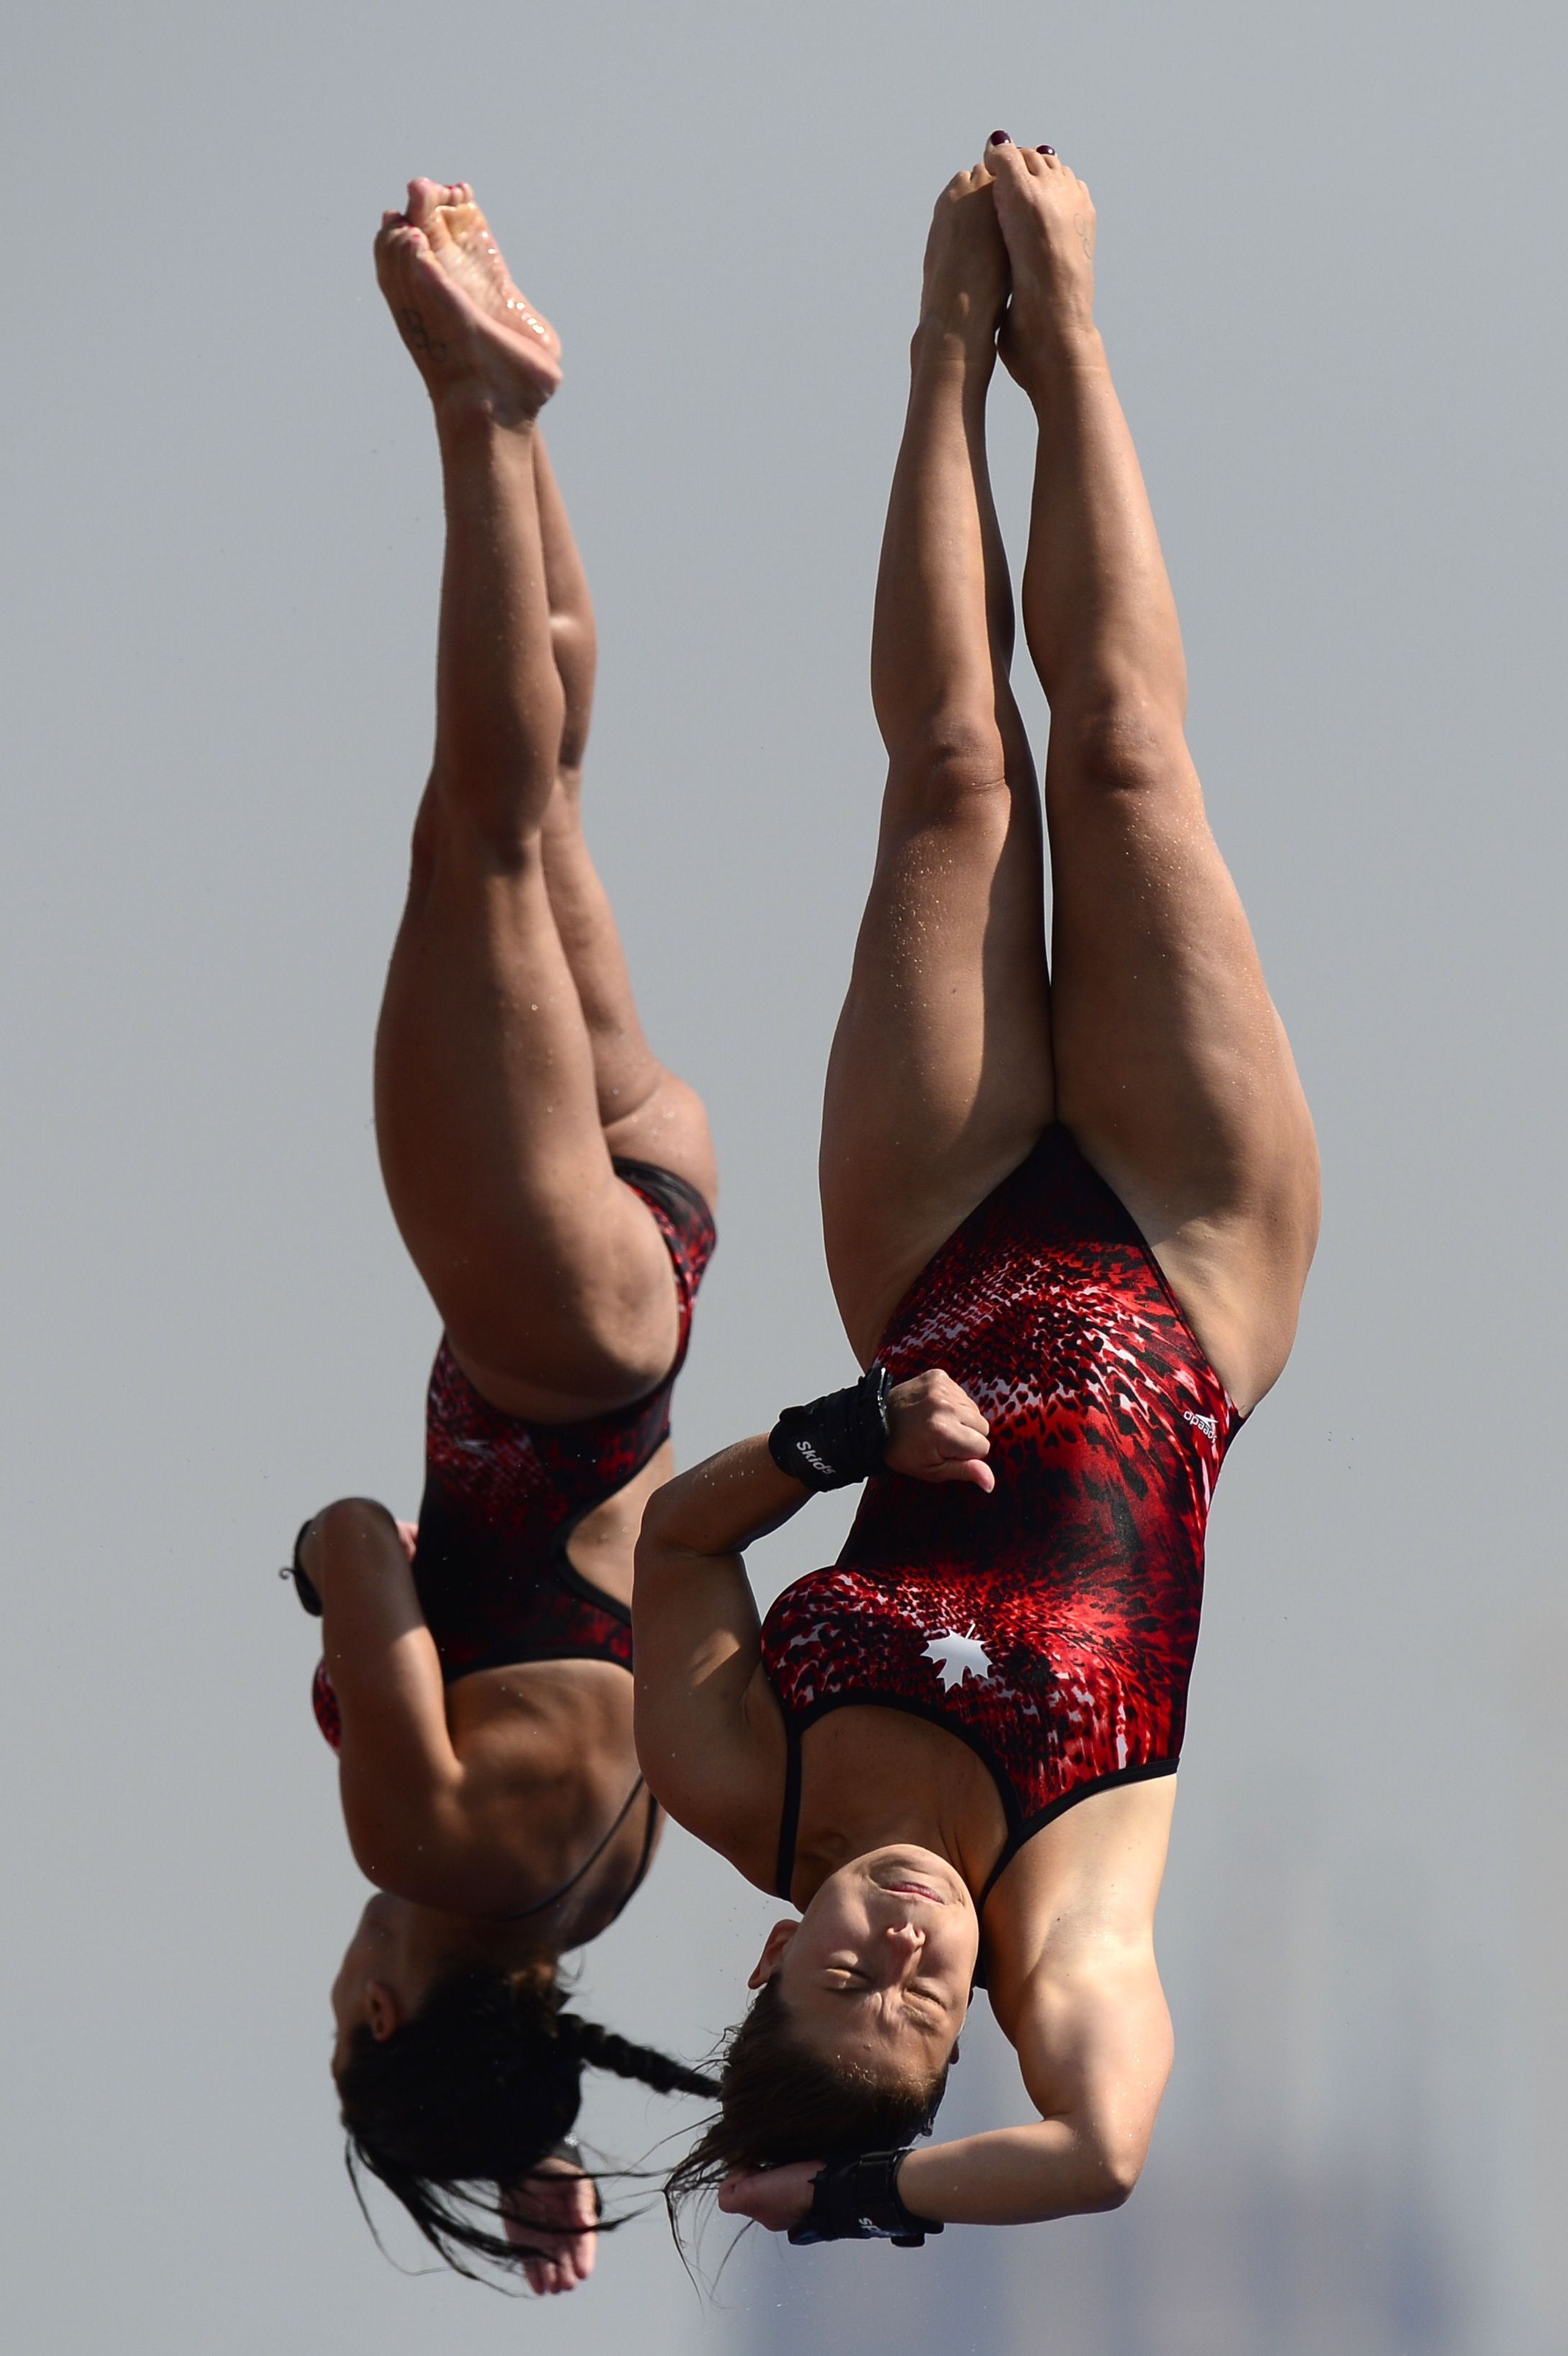 Women's 10m Platform Synchronised Diving 15th FINA